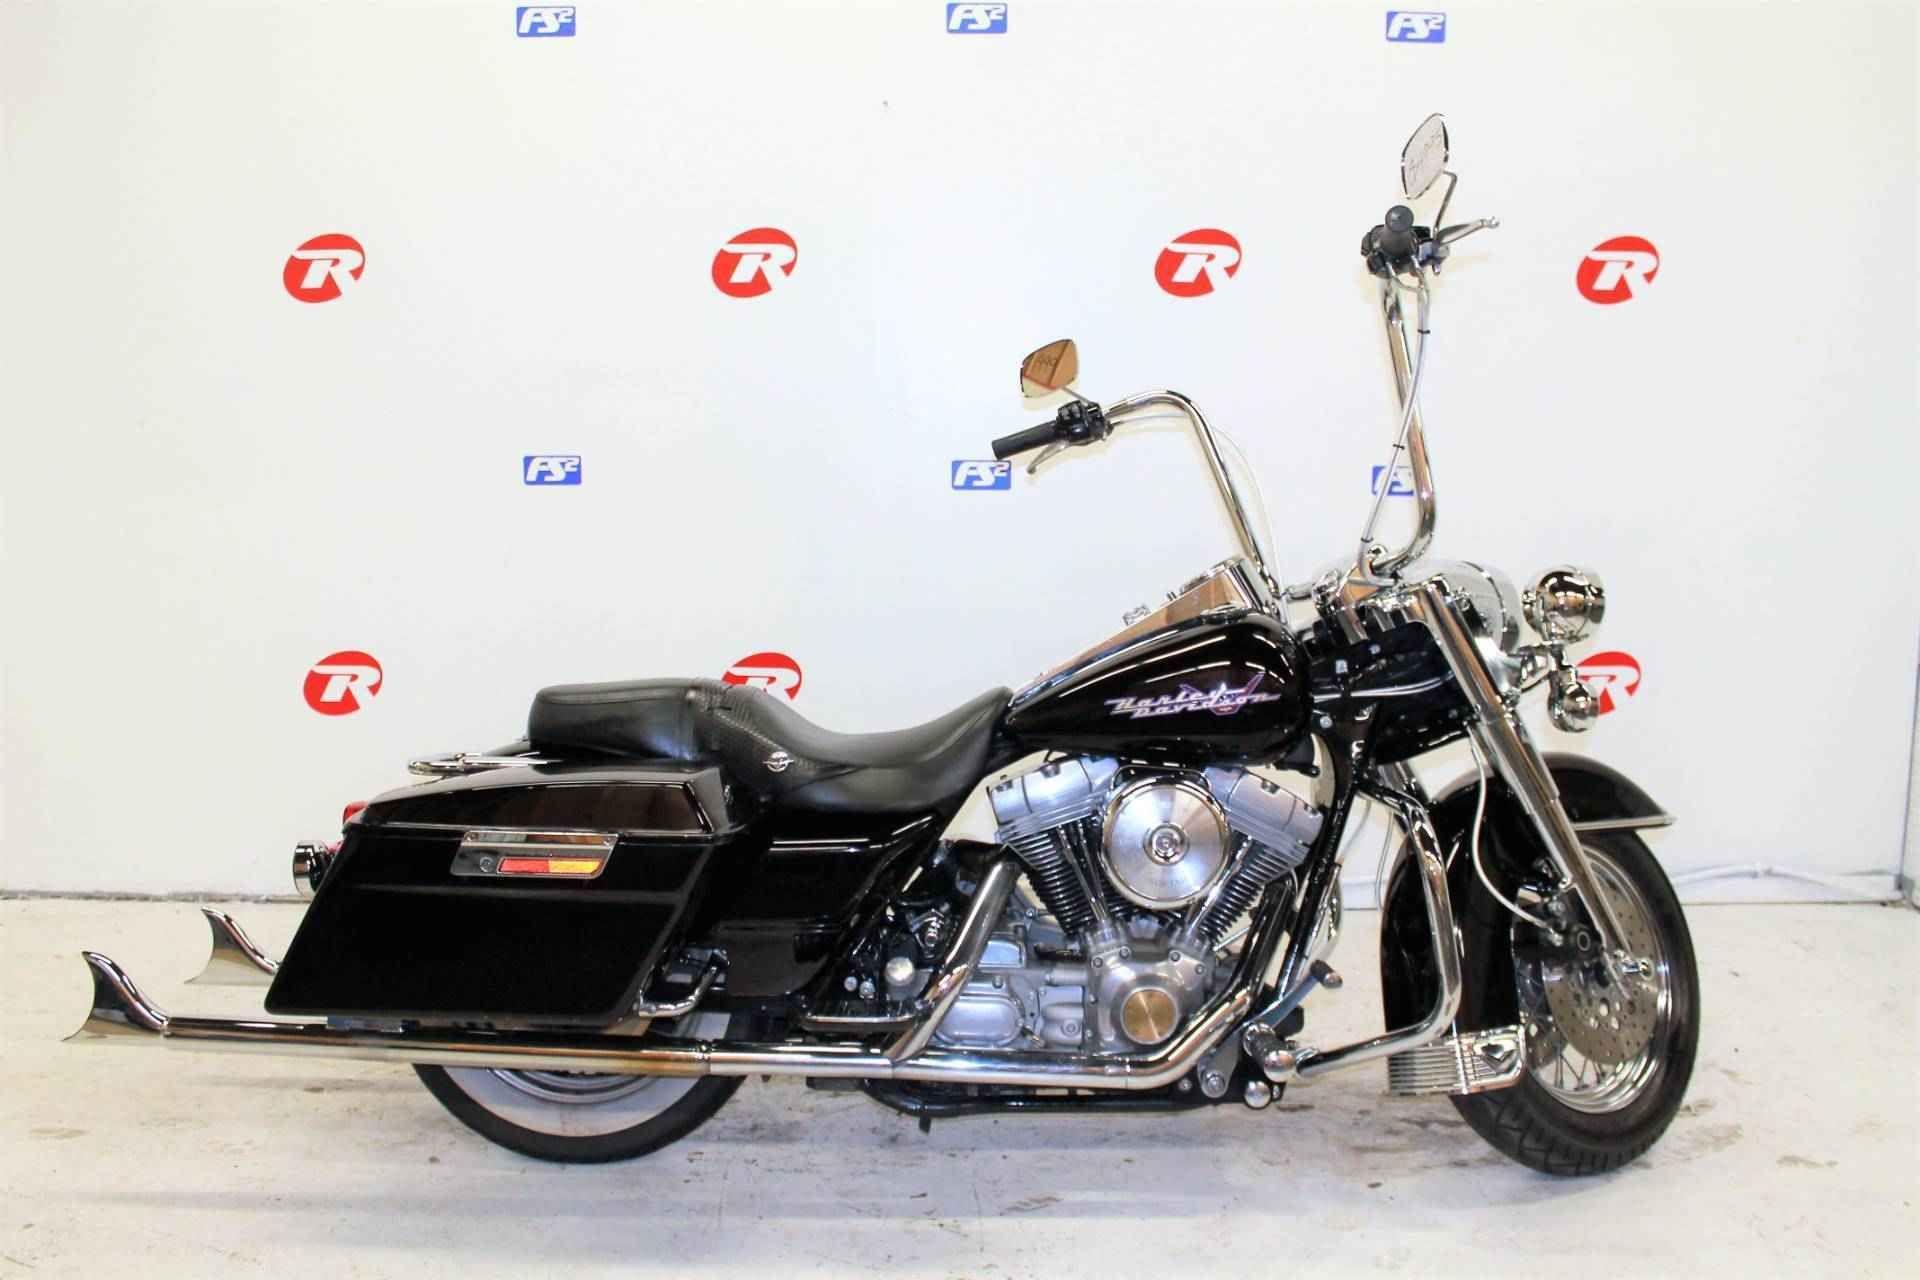 1999 Harley Davidson Flht Electra Glidea Standard Harley Davidson Softail Bobber Harley [ 1280 x 1920 Pixel ]